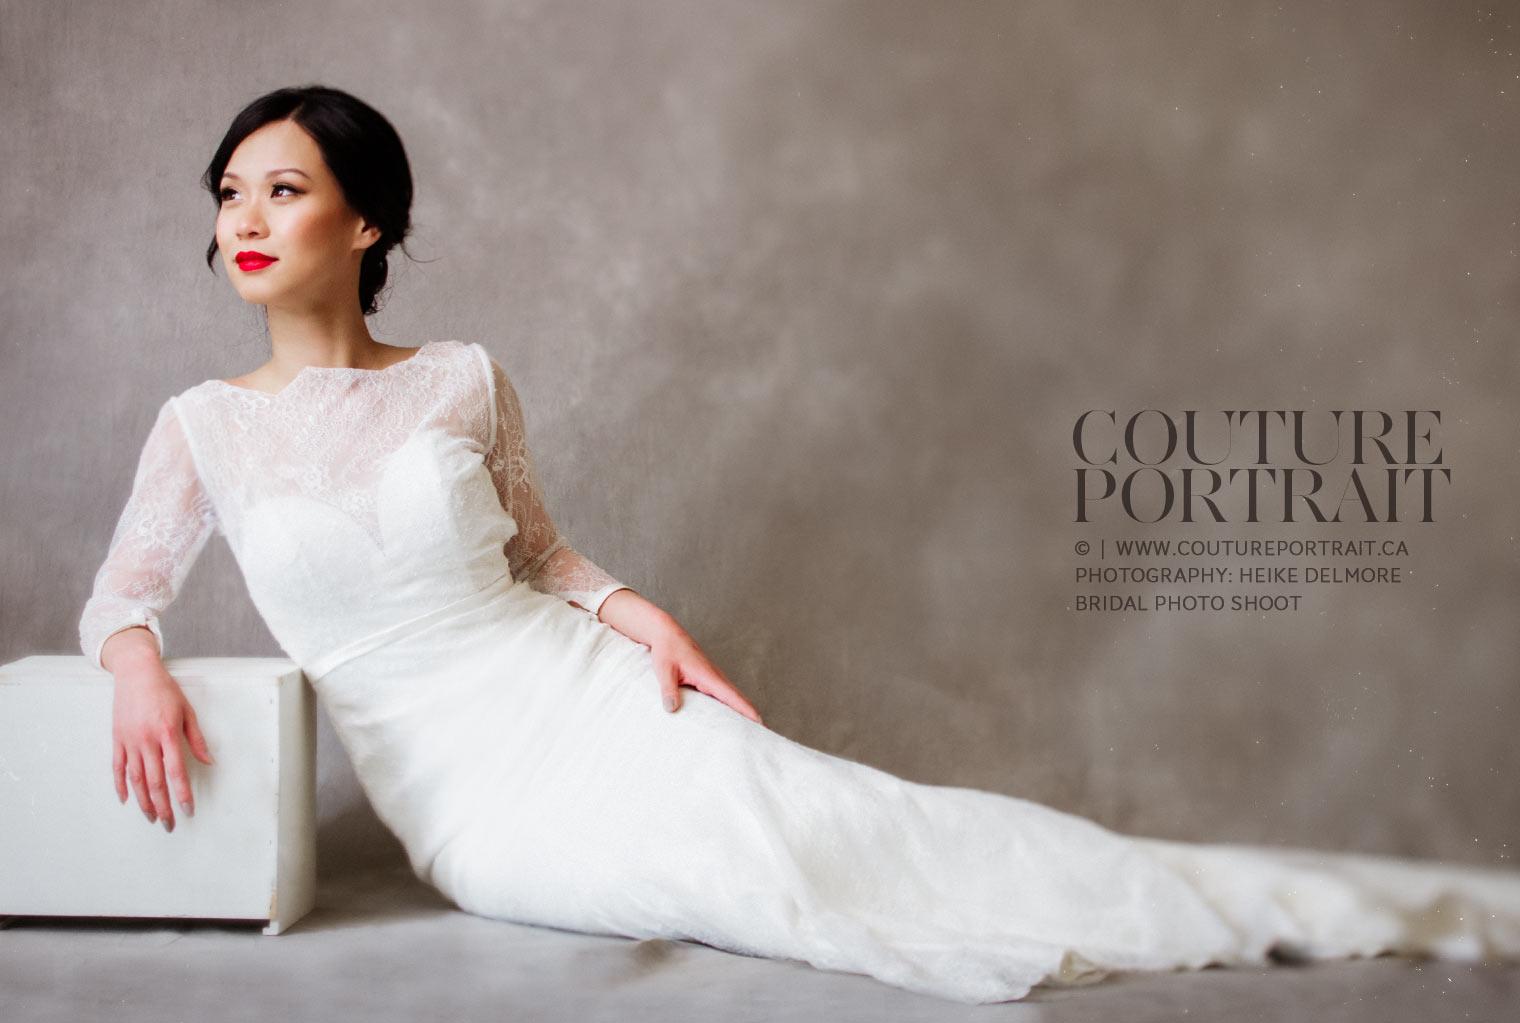 Bridal session couture portrait Windsor Ontario